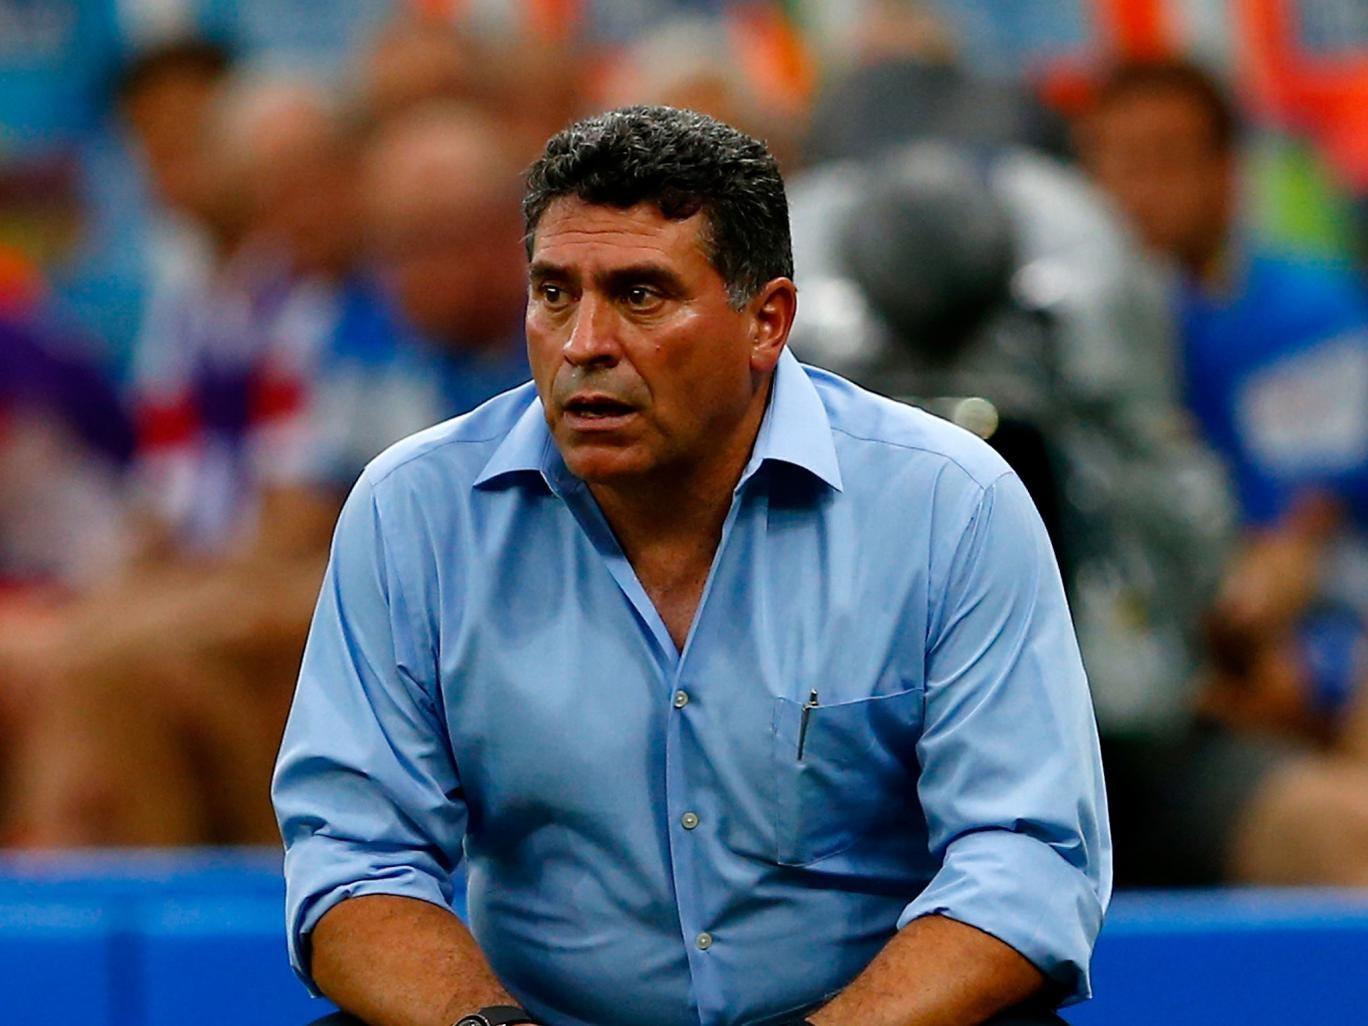 Luis Suarez has left his position as Honduras coach